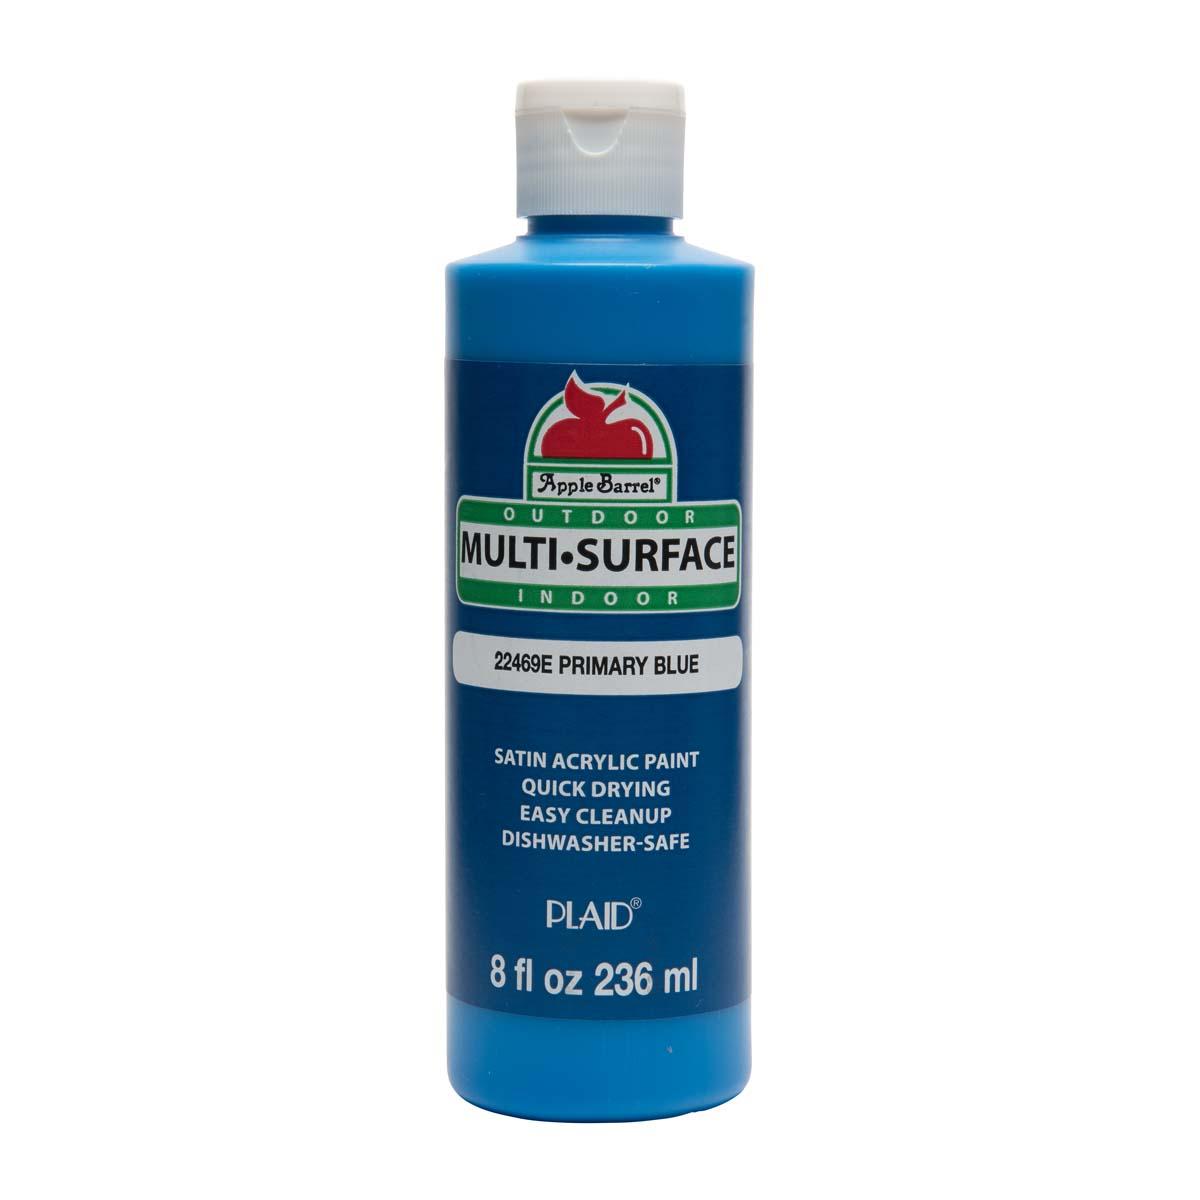 Apple Barrel ® Multi-Surface Satin Acrylic Paints - Primary Blue, 8 oz.